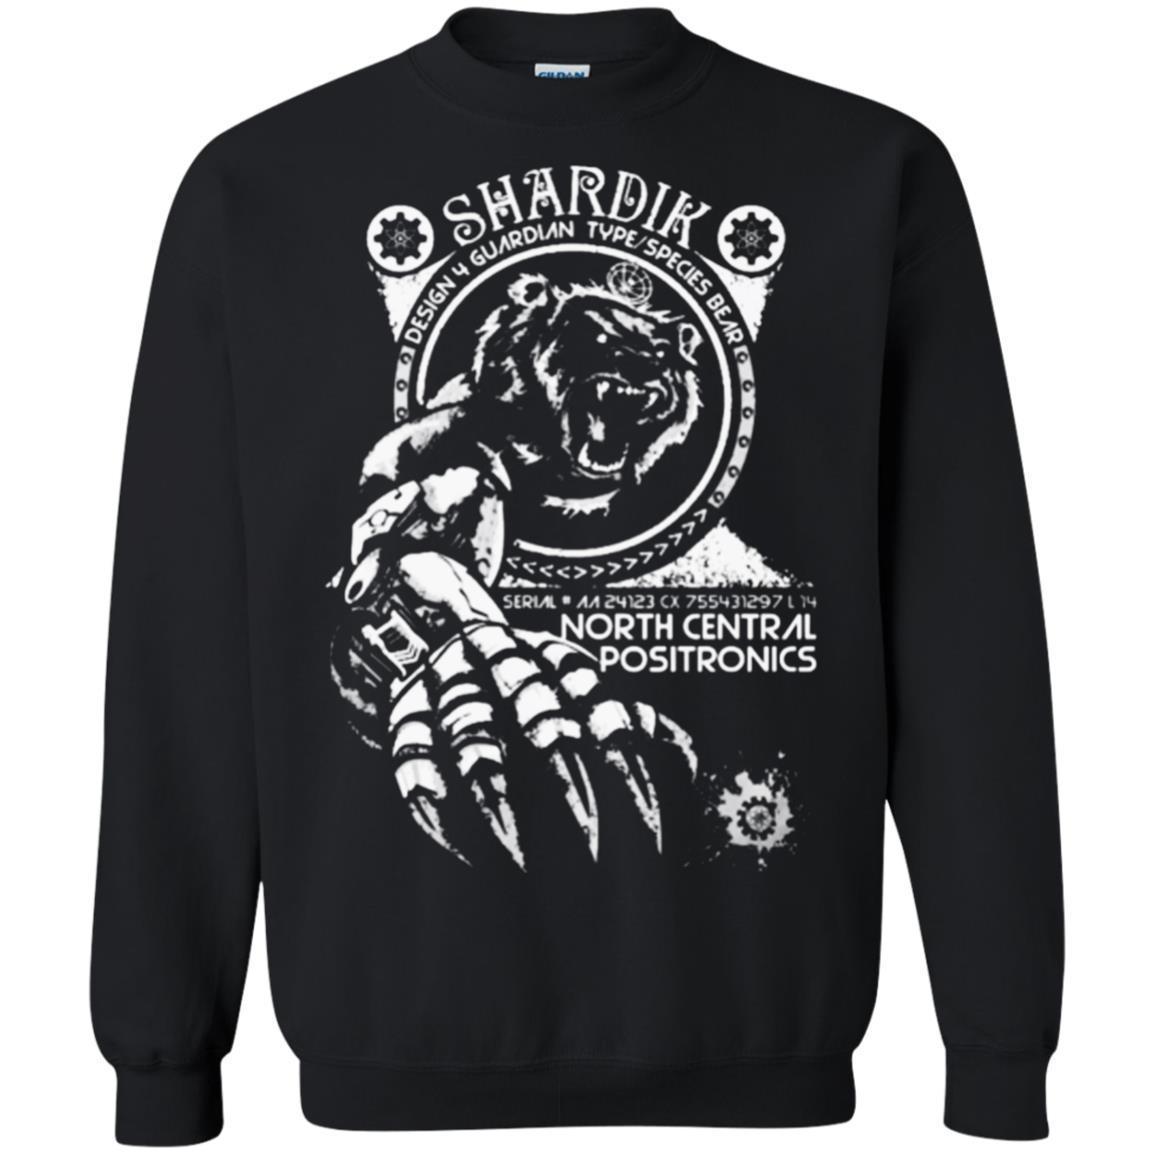 Order The Dark Tower Shardik The Bear Of Rsome Stephen King Shirts